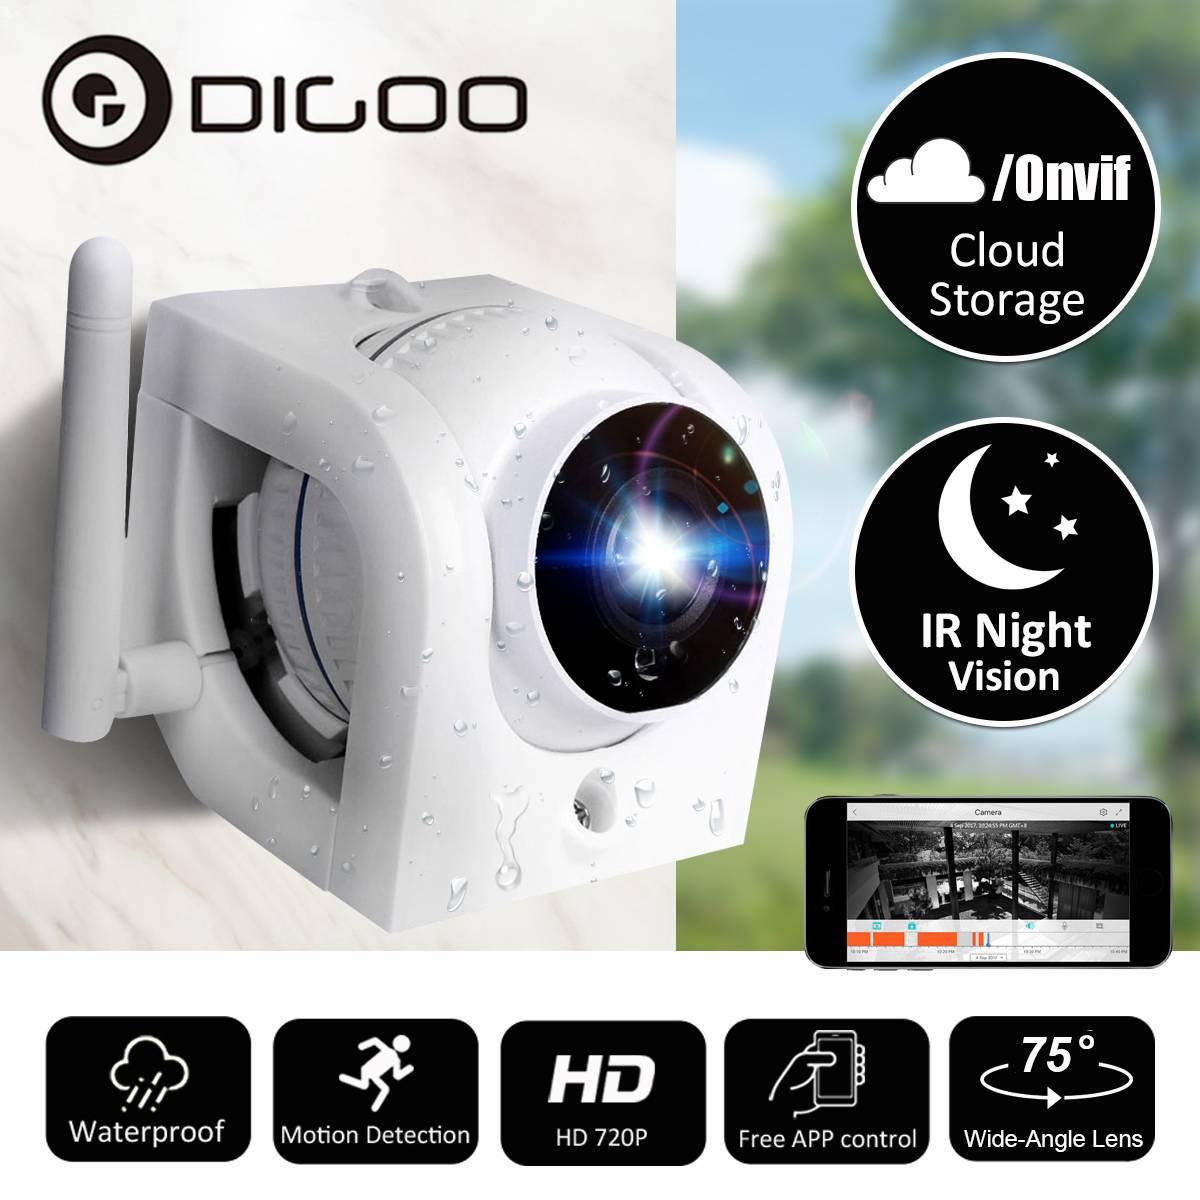 Digoo DG-W02f 720P Outdoor WIFI Security IP Camera Monitor Cloud Storage Waterproof Onvif APP Alarm Motion Detection